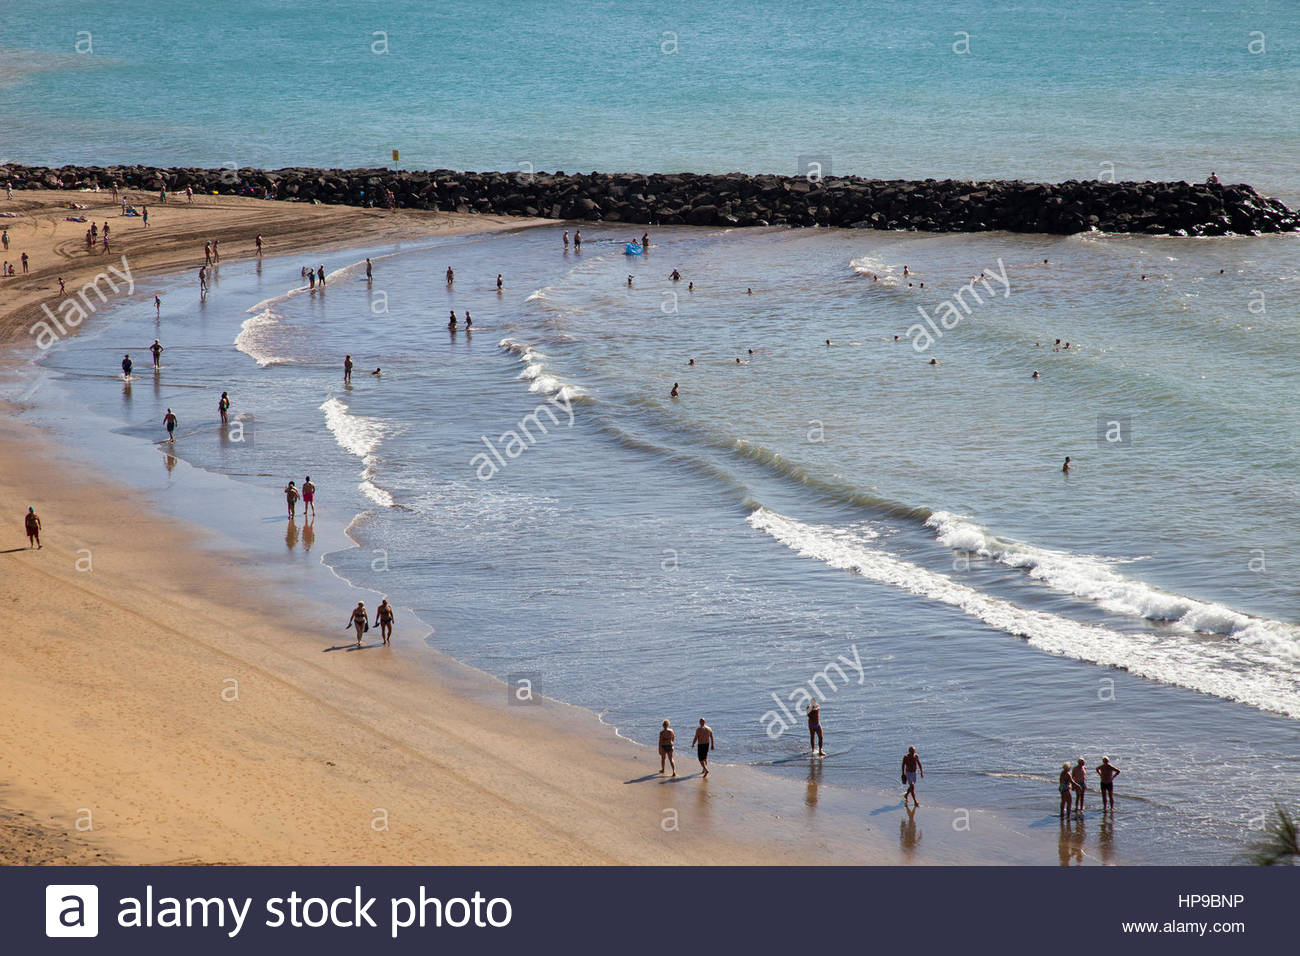 Maspalomas, Promenade und Playa del Ingles, Gran Canaria, Canarie, spagna Stockbild